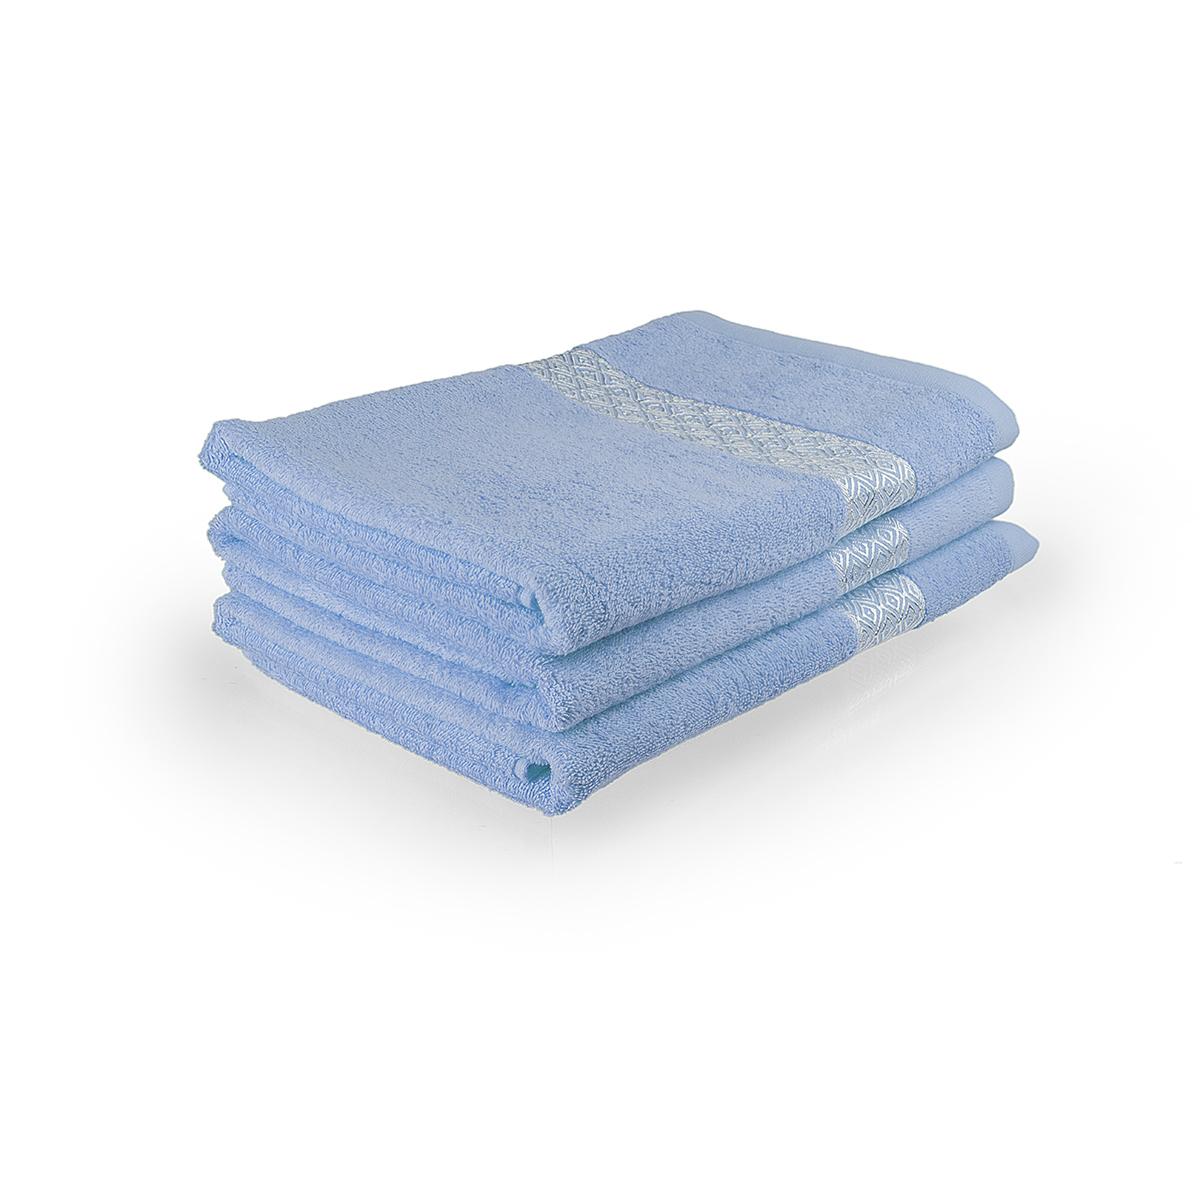 Полотенце Серебро Голубой, размер 50х90 смМахровые полотенца<br>Плотность ткани:360 г/кв. м.<br><br>Тип: Полотенце<br>Размер: 50х90<br>Материал: Махра